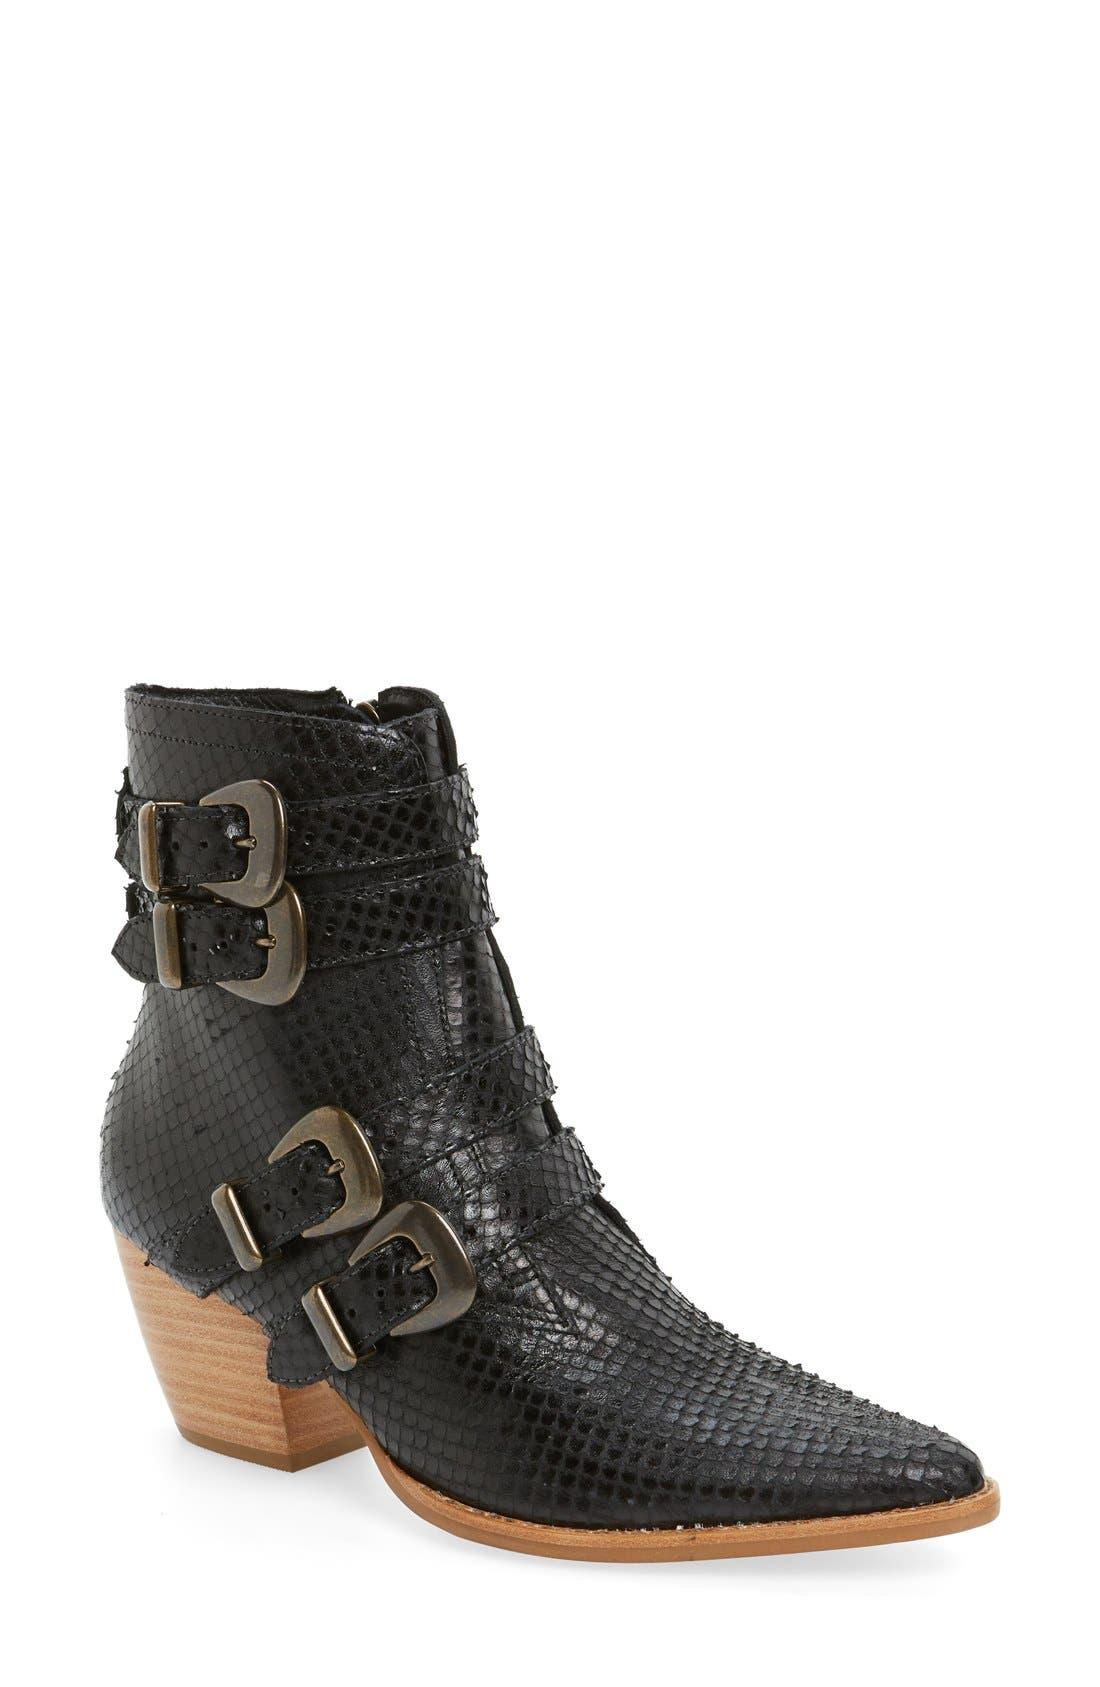 Alternate Image 1 Selected - Matisse 'Harvey' Embossed Buckle Boot (Women)